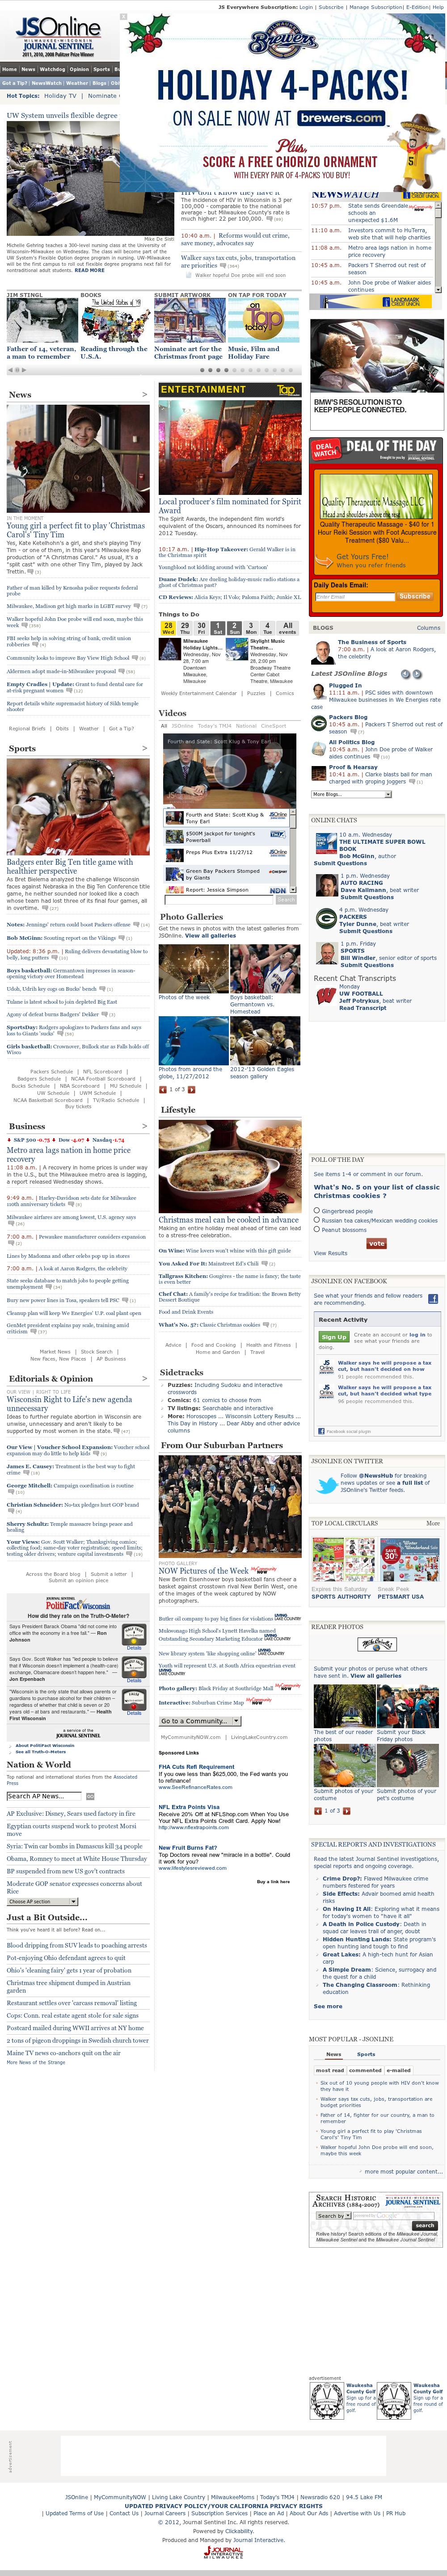 Milwaukee Journal Sentinel at Wednesday Nov. 28, 2012, 5:19 p.m. UTC